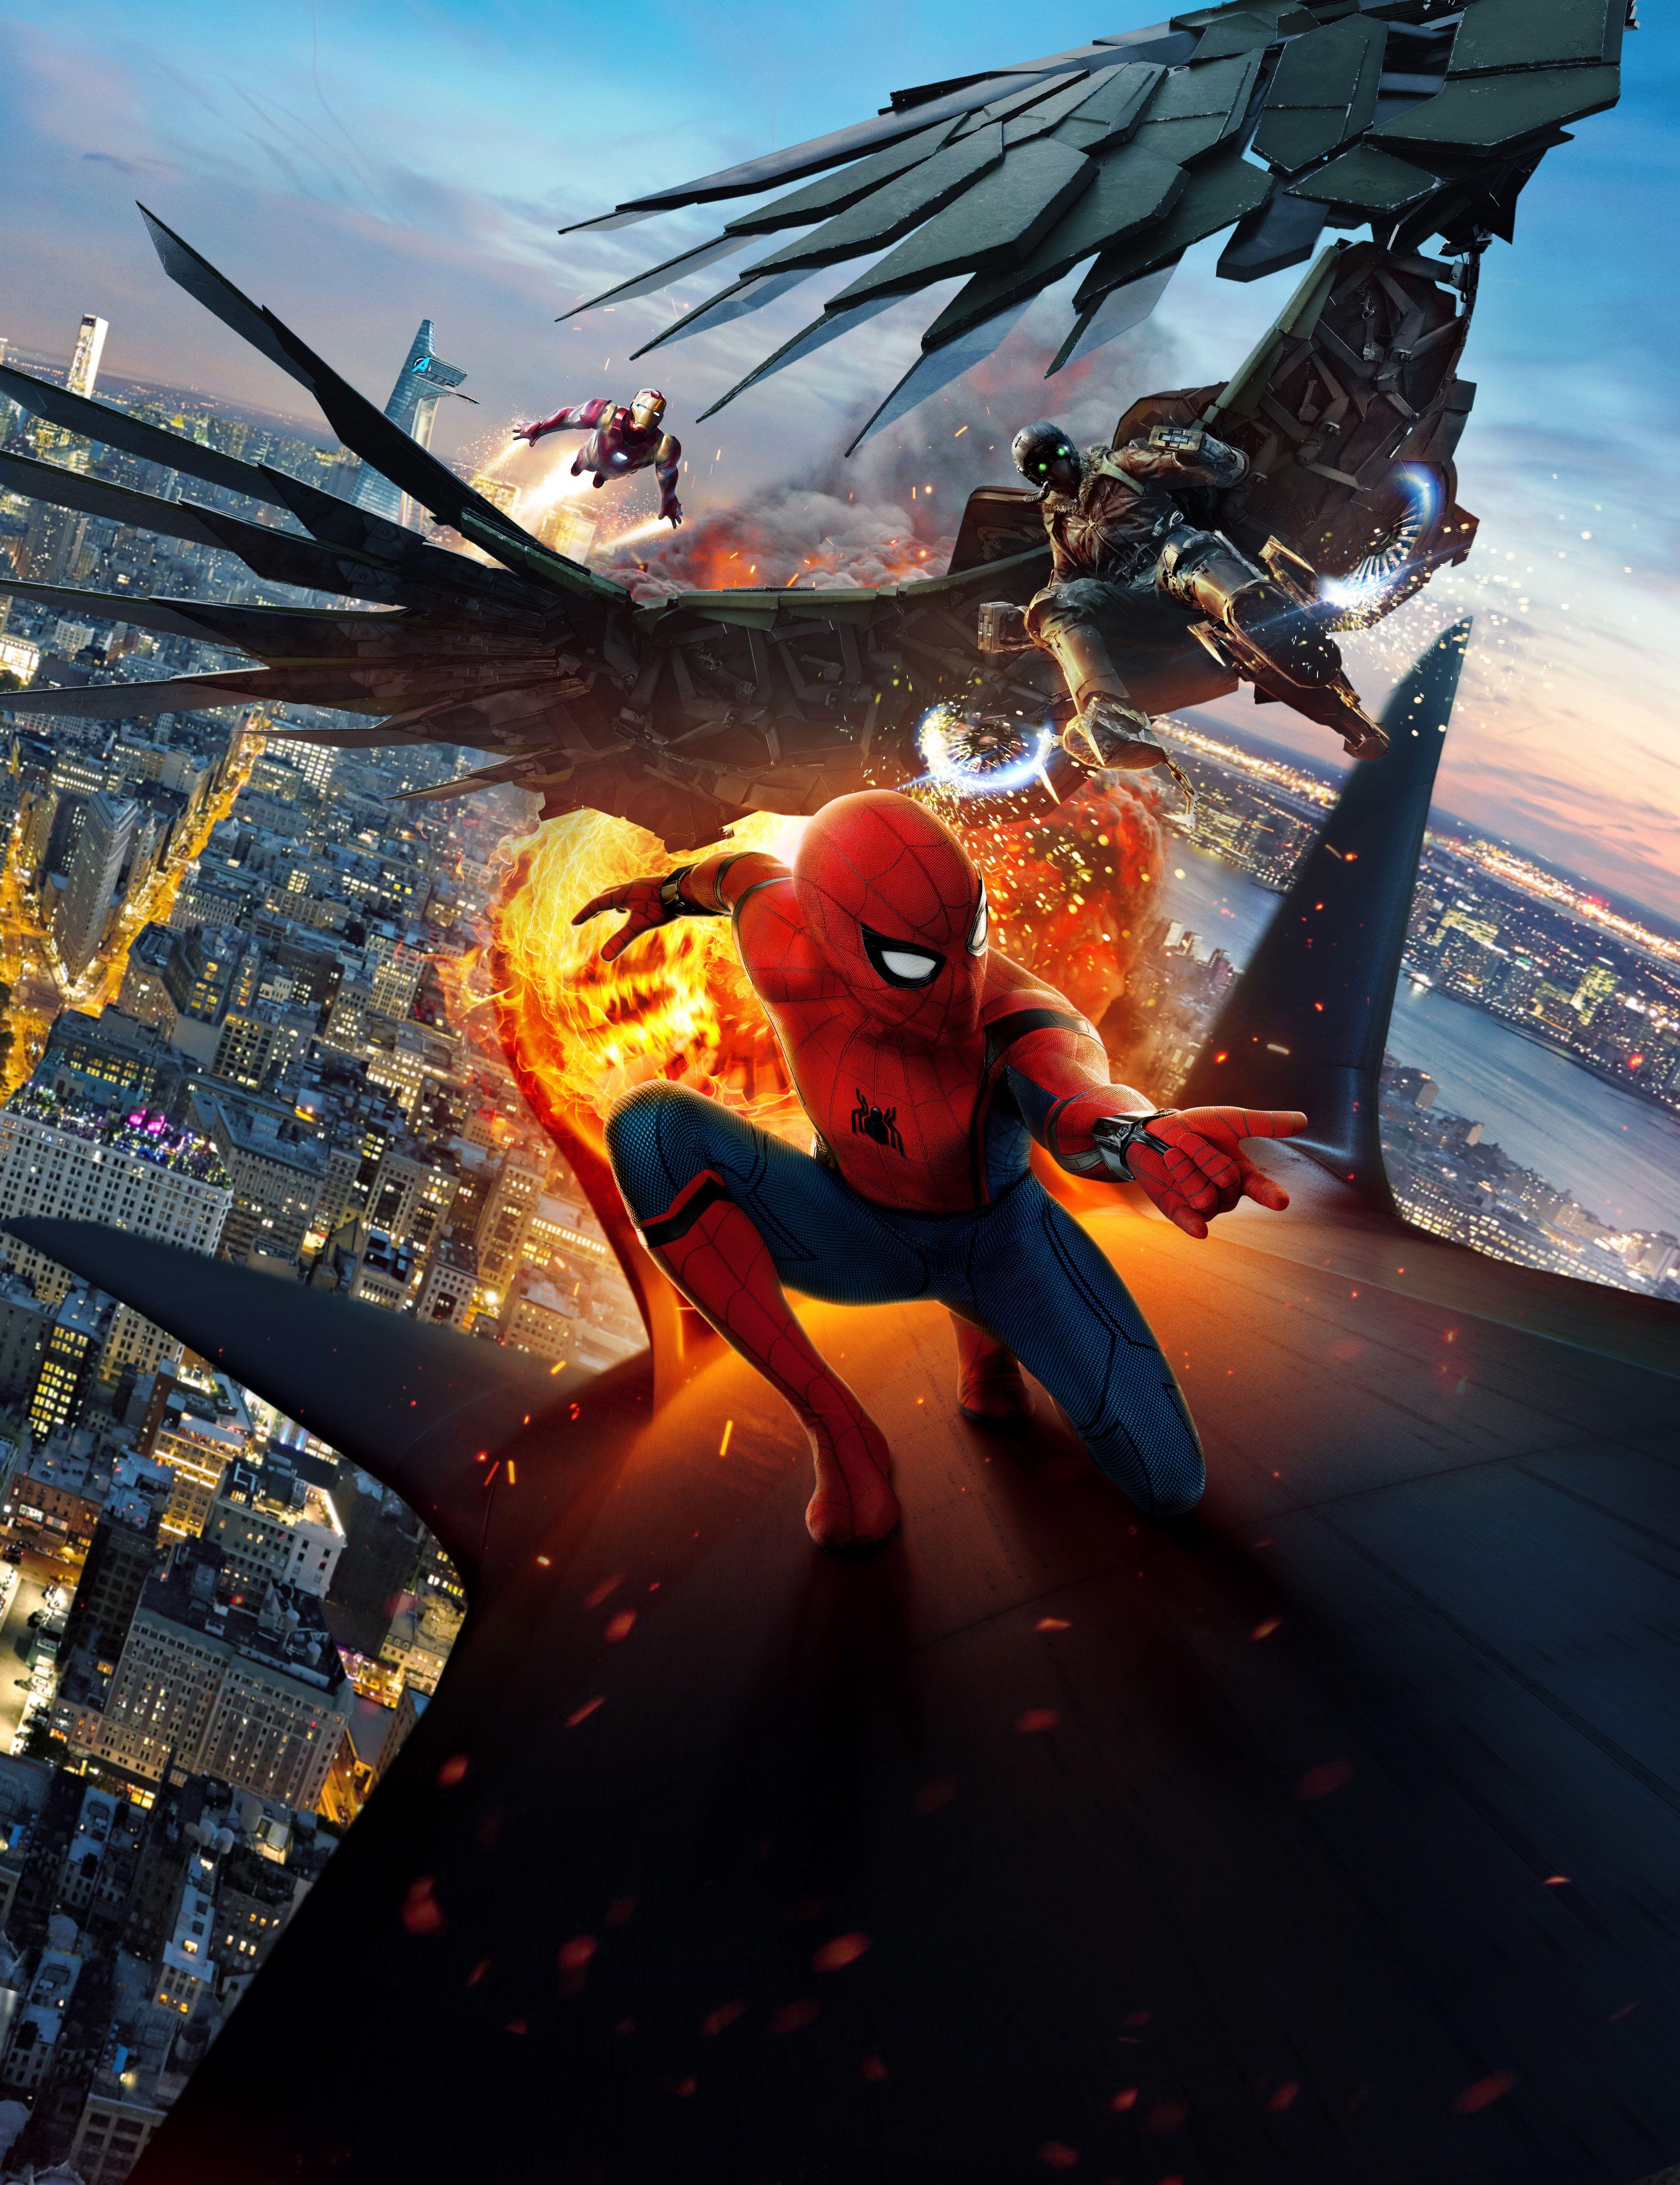 4k Spider Man Homecoming Iron Man Vulture 4k Wallpaper Hdwallpaper Desktop In 2020 Spiderman Images Man Wallpaper Spiderman Pictures